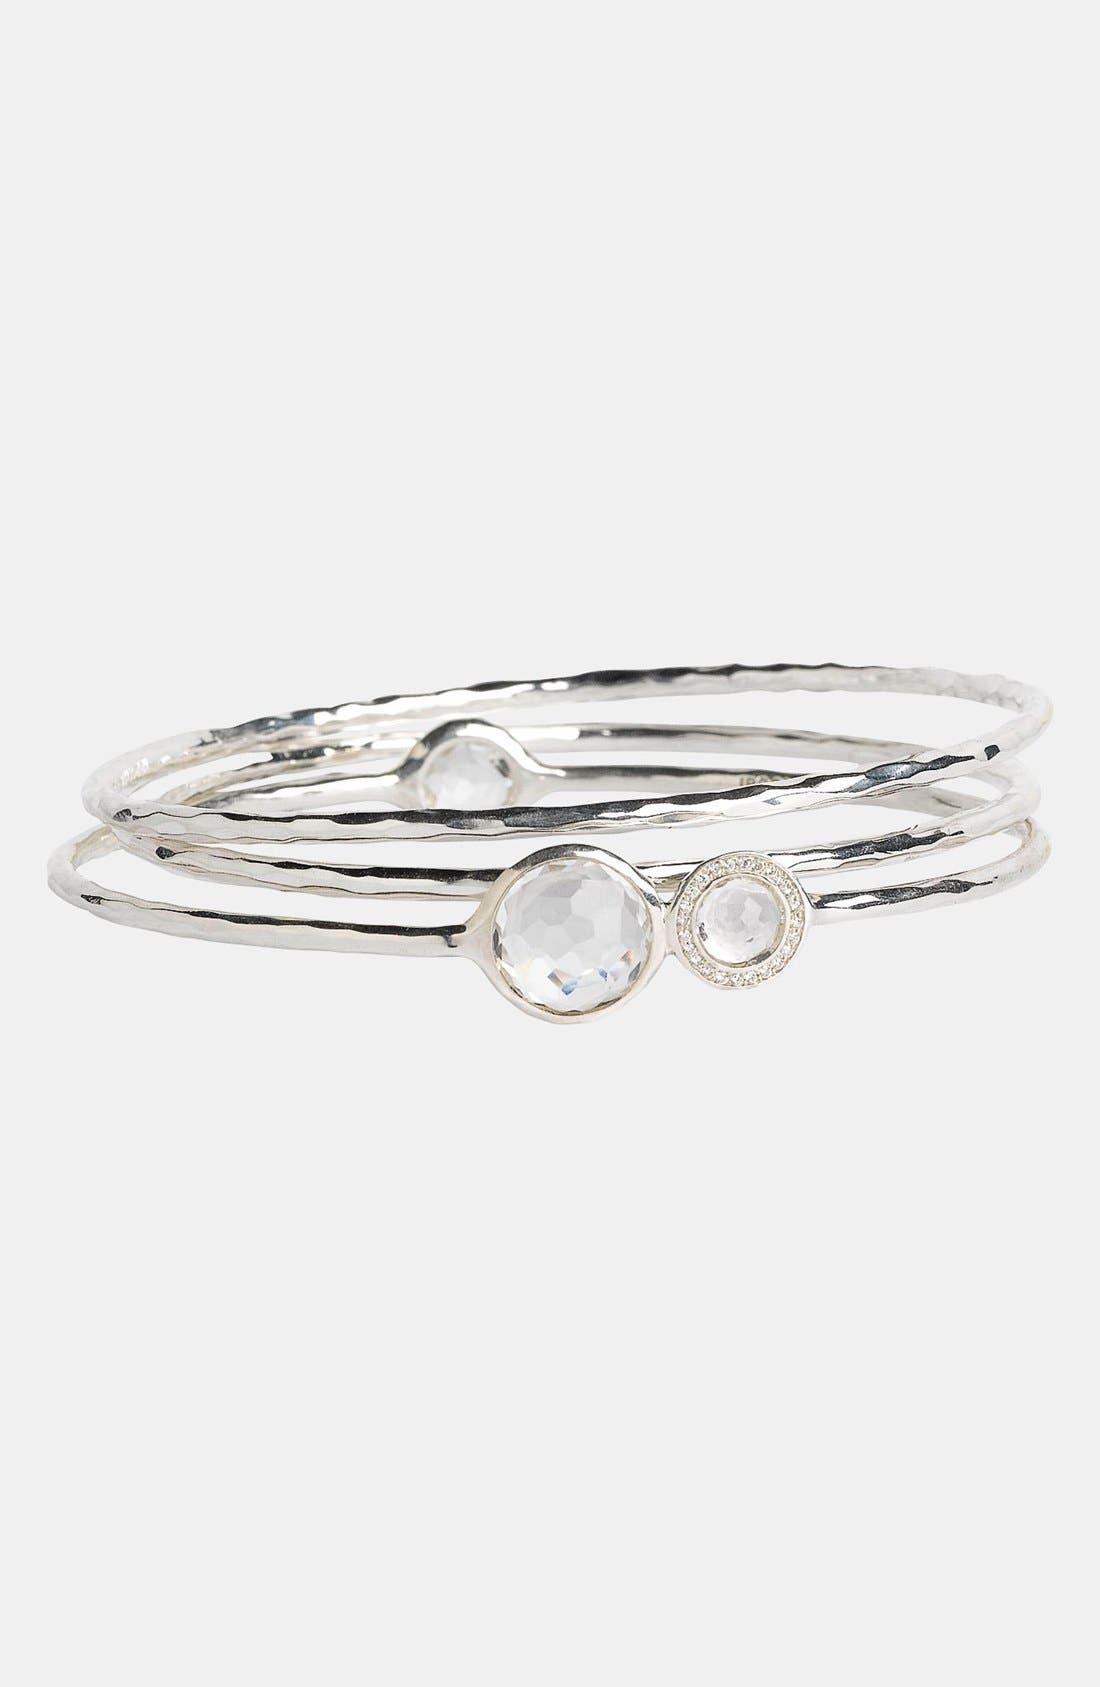 Main Image - Ippolita 'Silver Diamond - Lollipop' Stone & Diamond Bangles (Set of 3) (Nordstrom Exclusive)